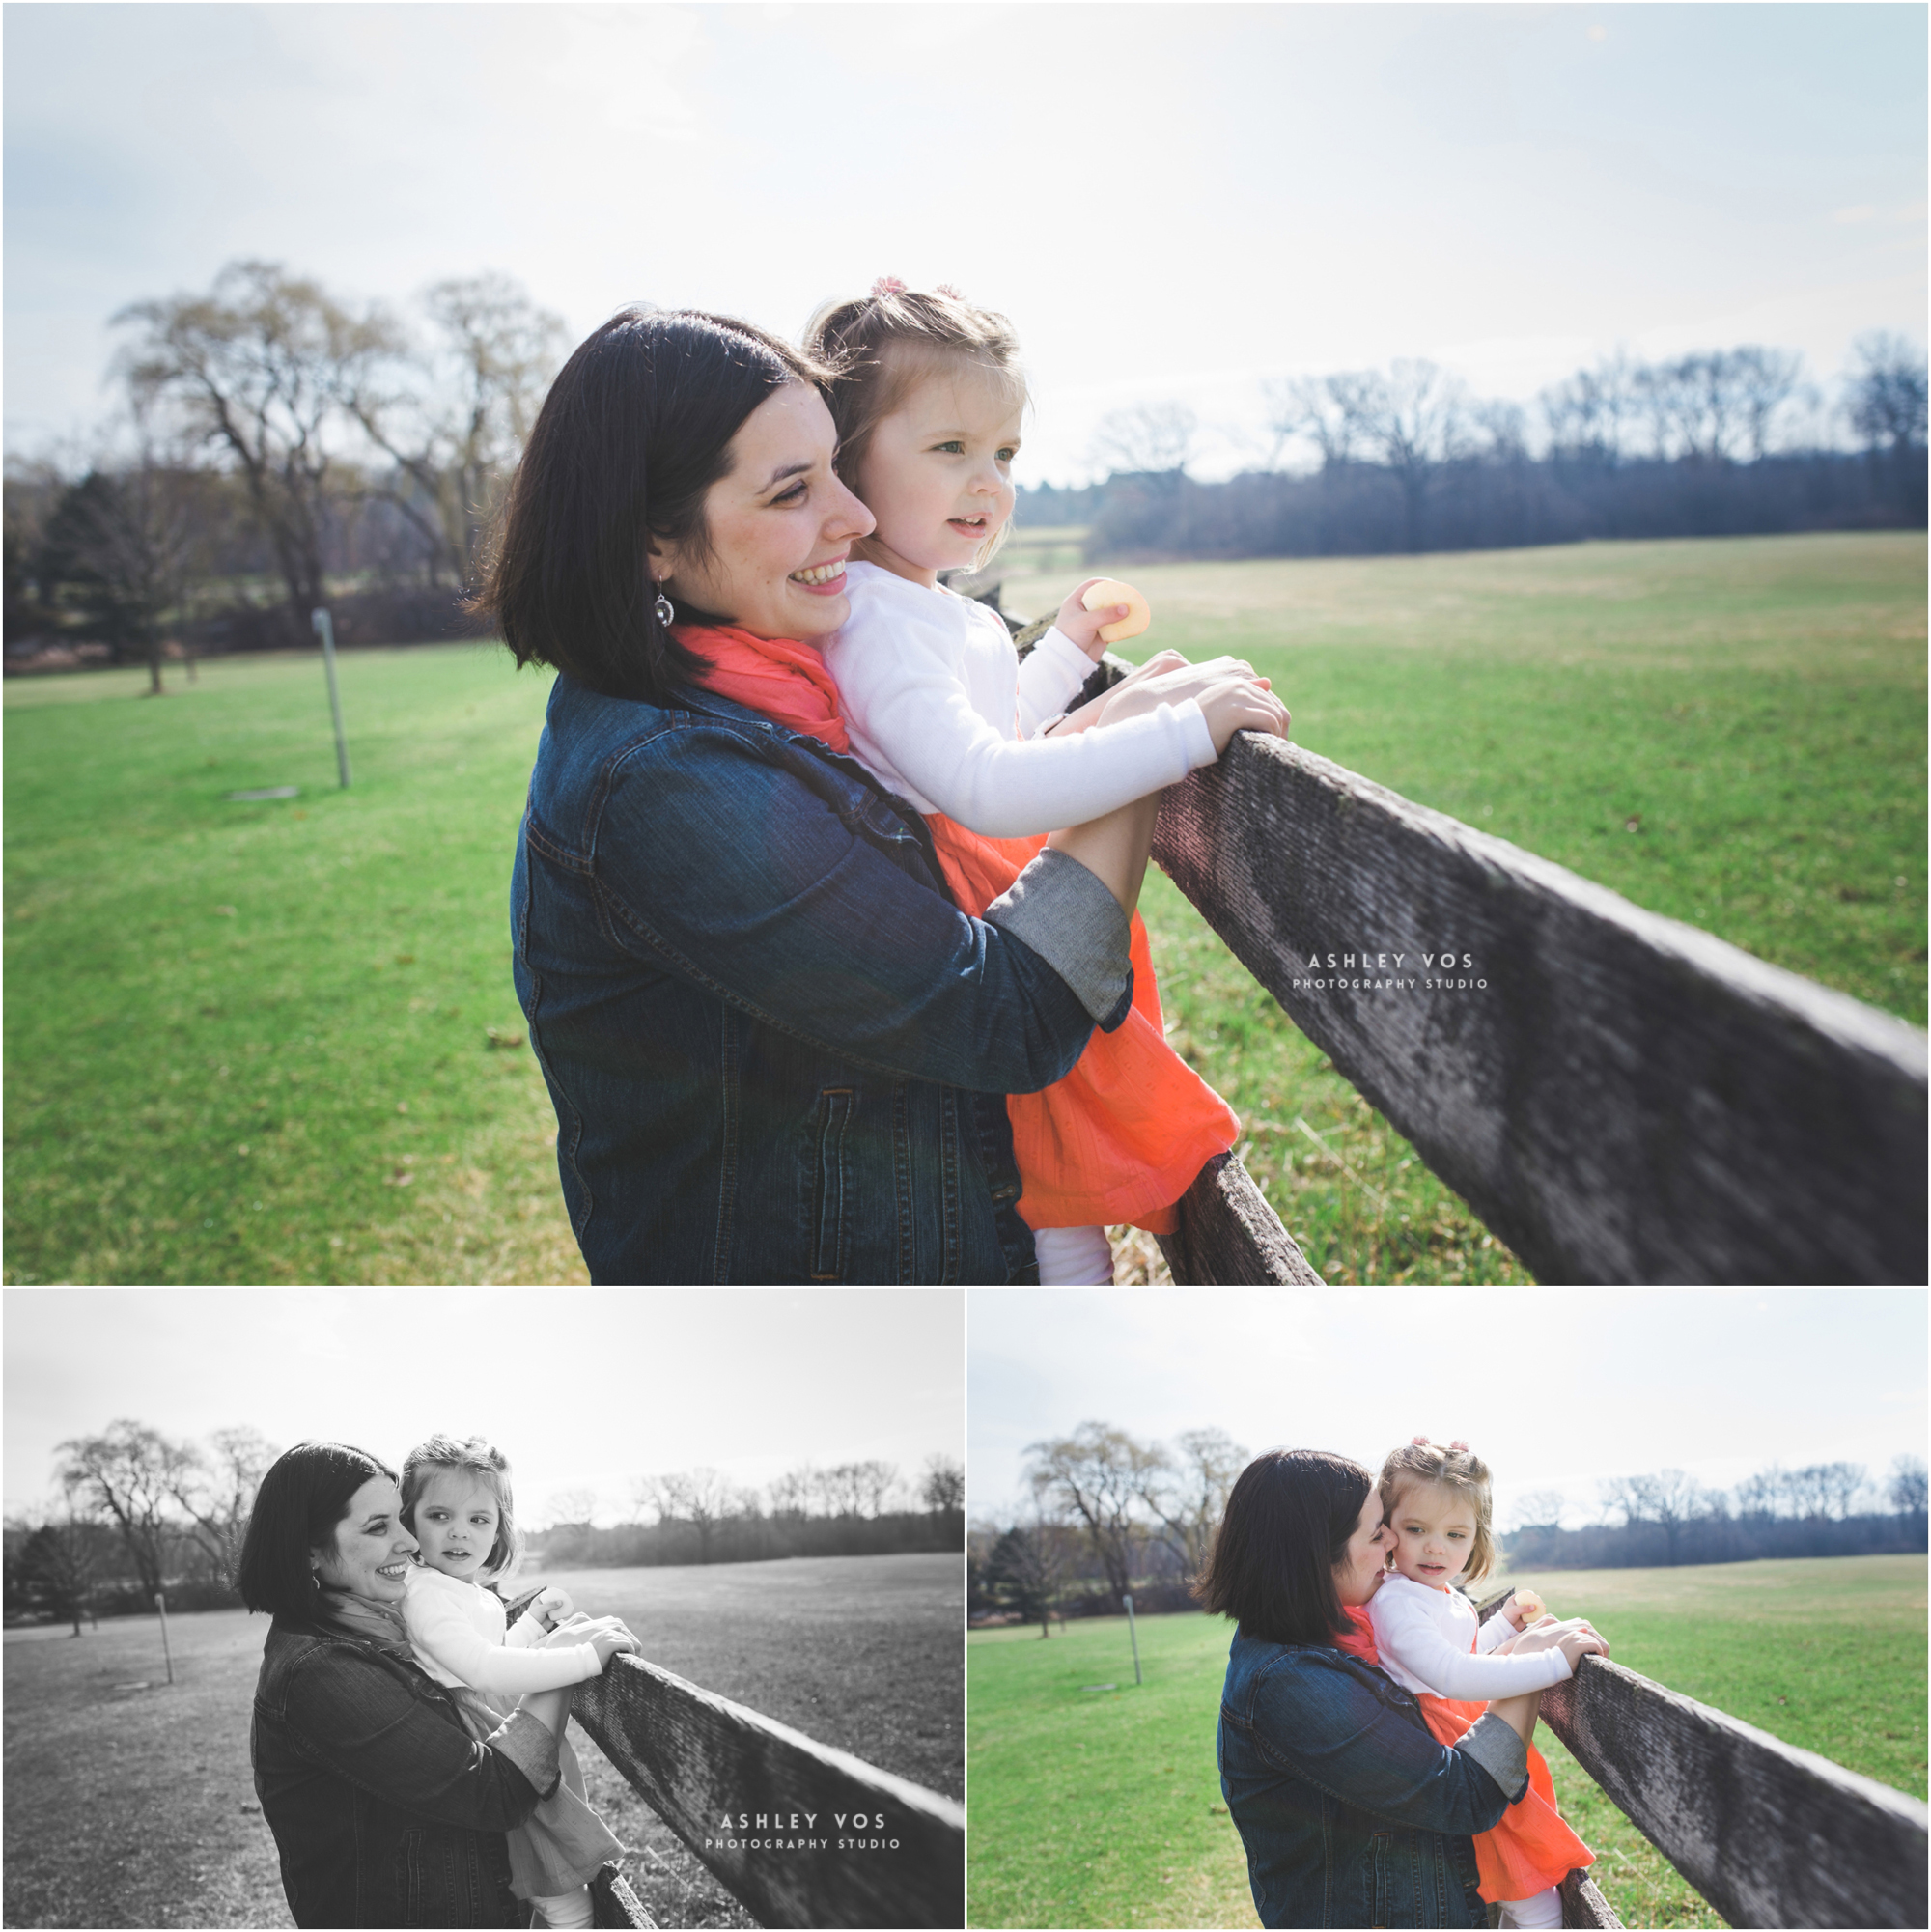 Ashley Vos Photography Seattle Lifestyle Family Photography_0039.jpg